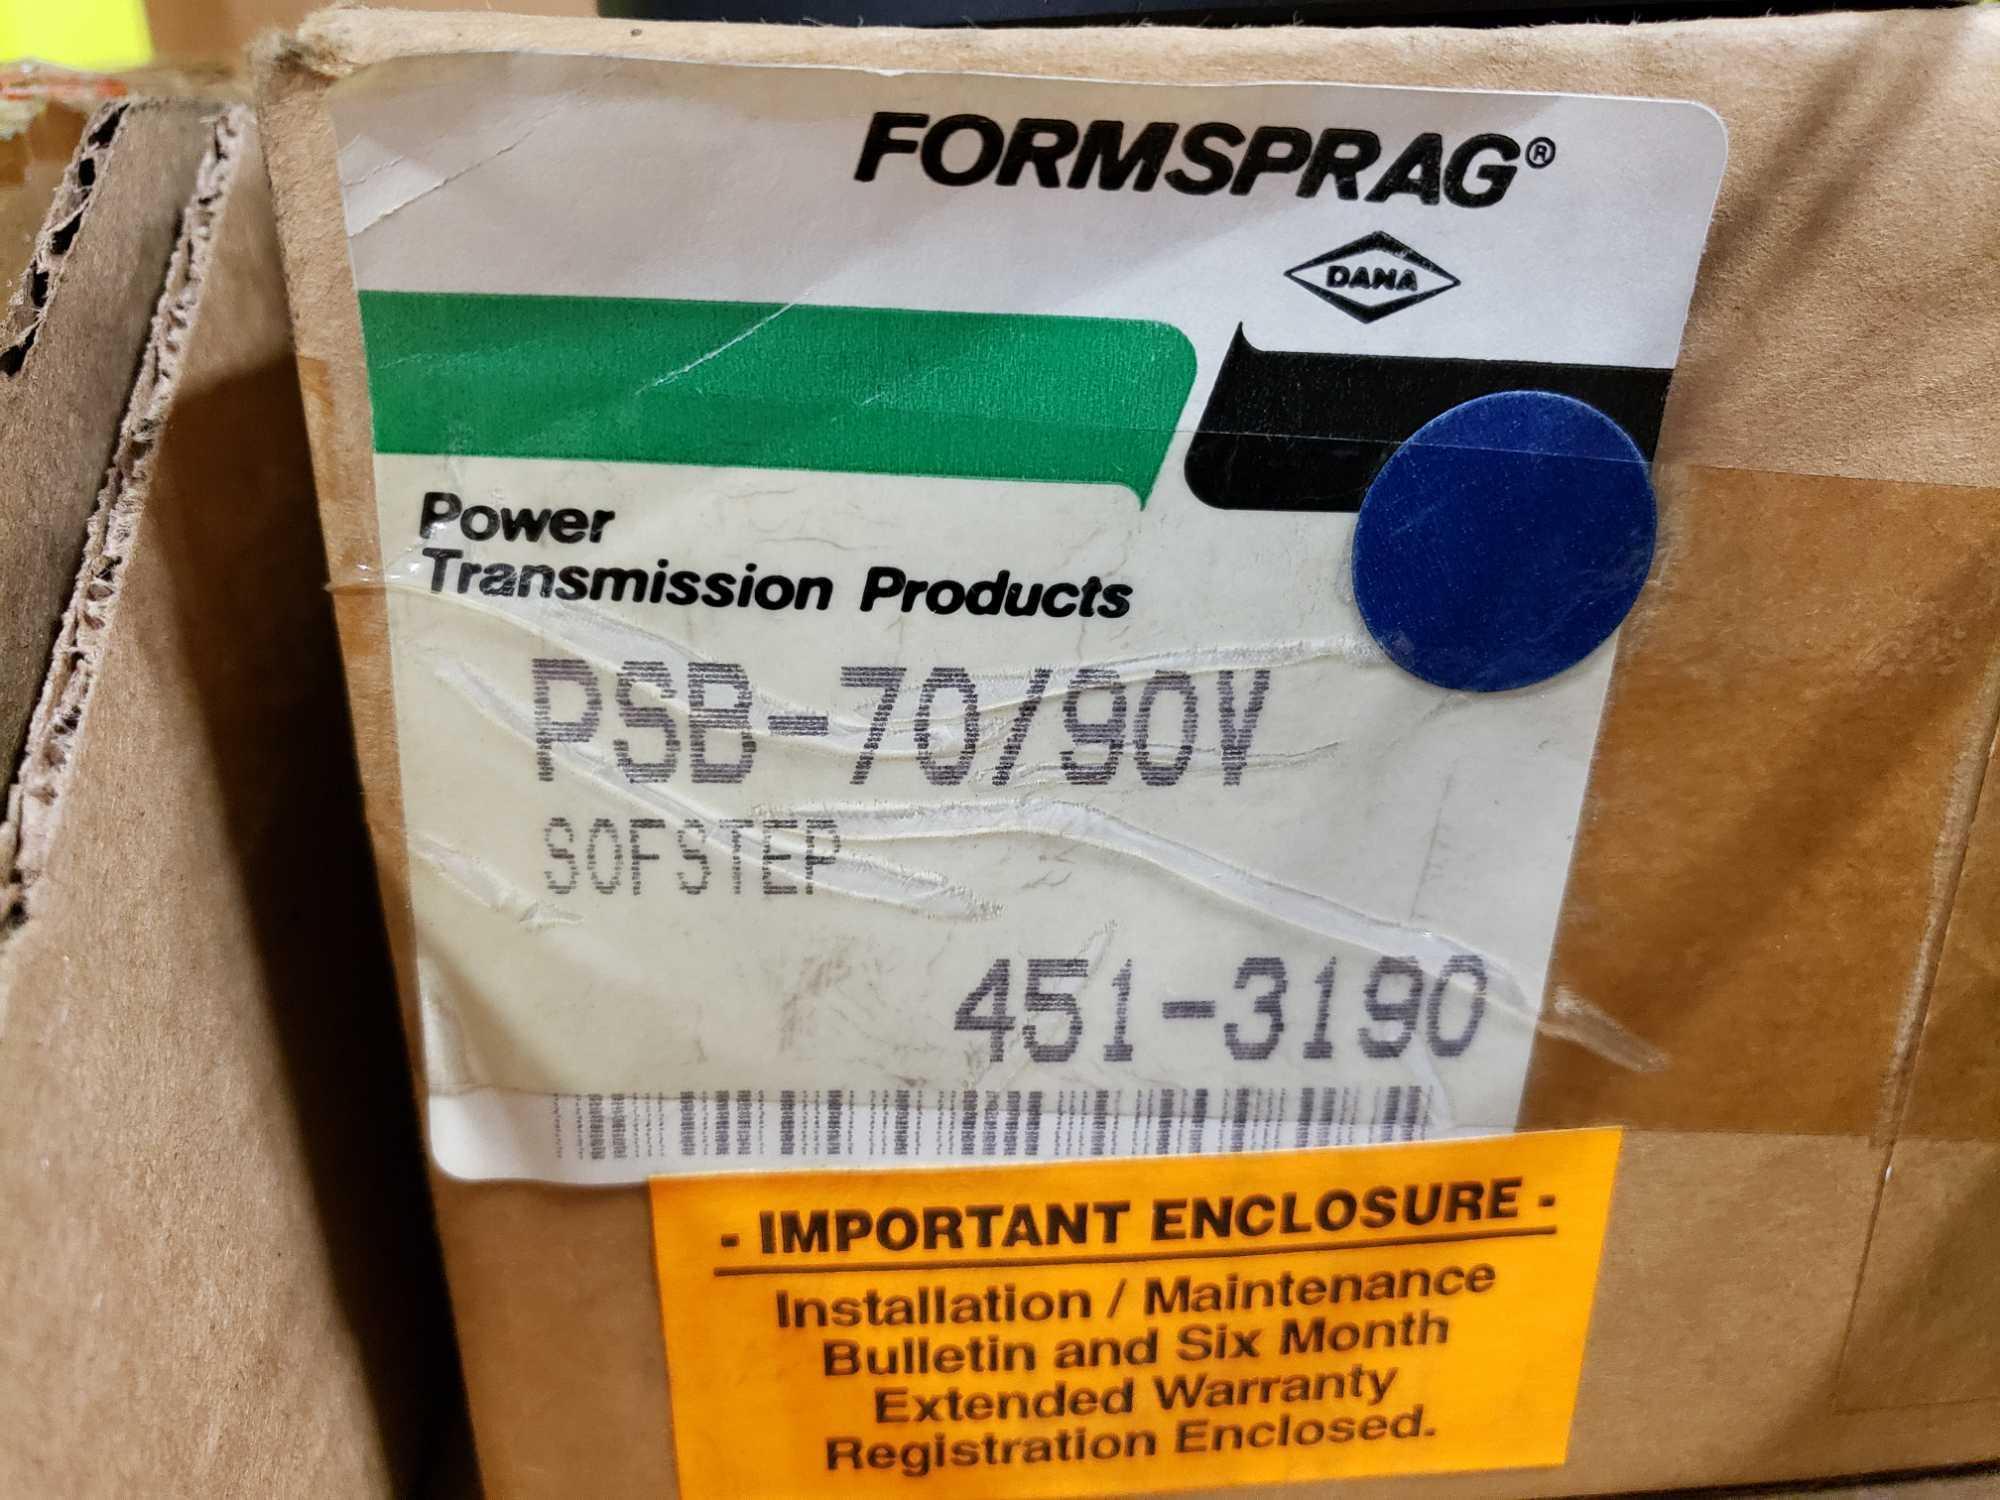 Formsprag Magpowr sofstep model PSB-70/90V magnetic partical clutch brake. New in box. - Image 3 of 3